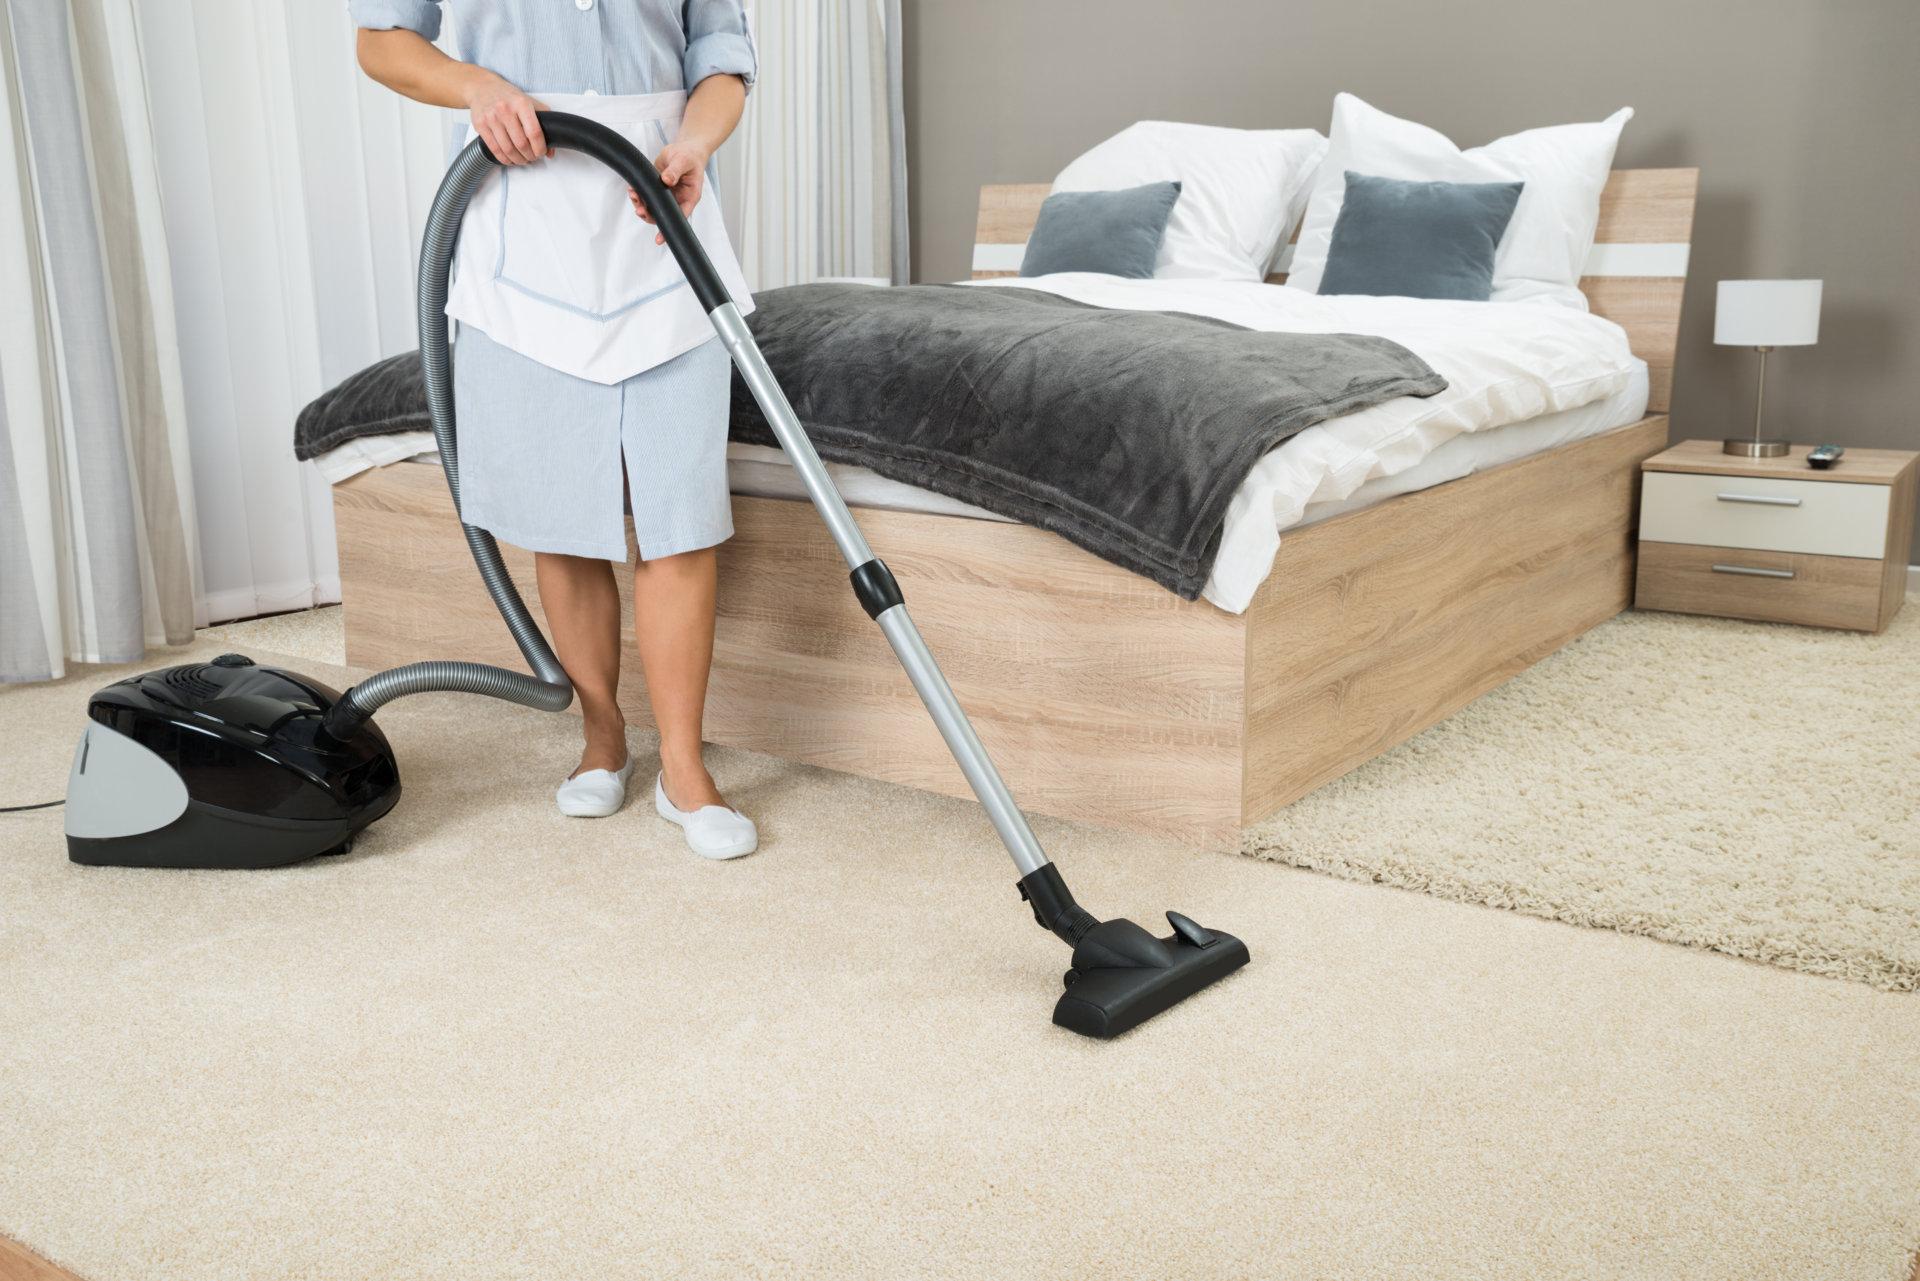 Consejos para limpiar moquetas